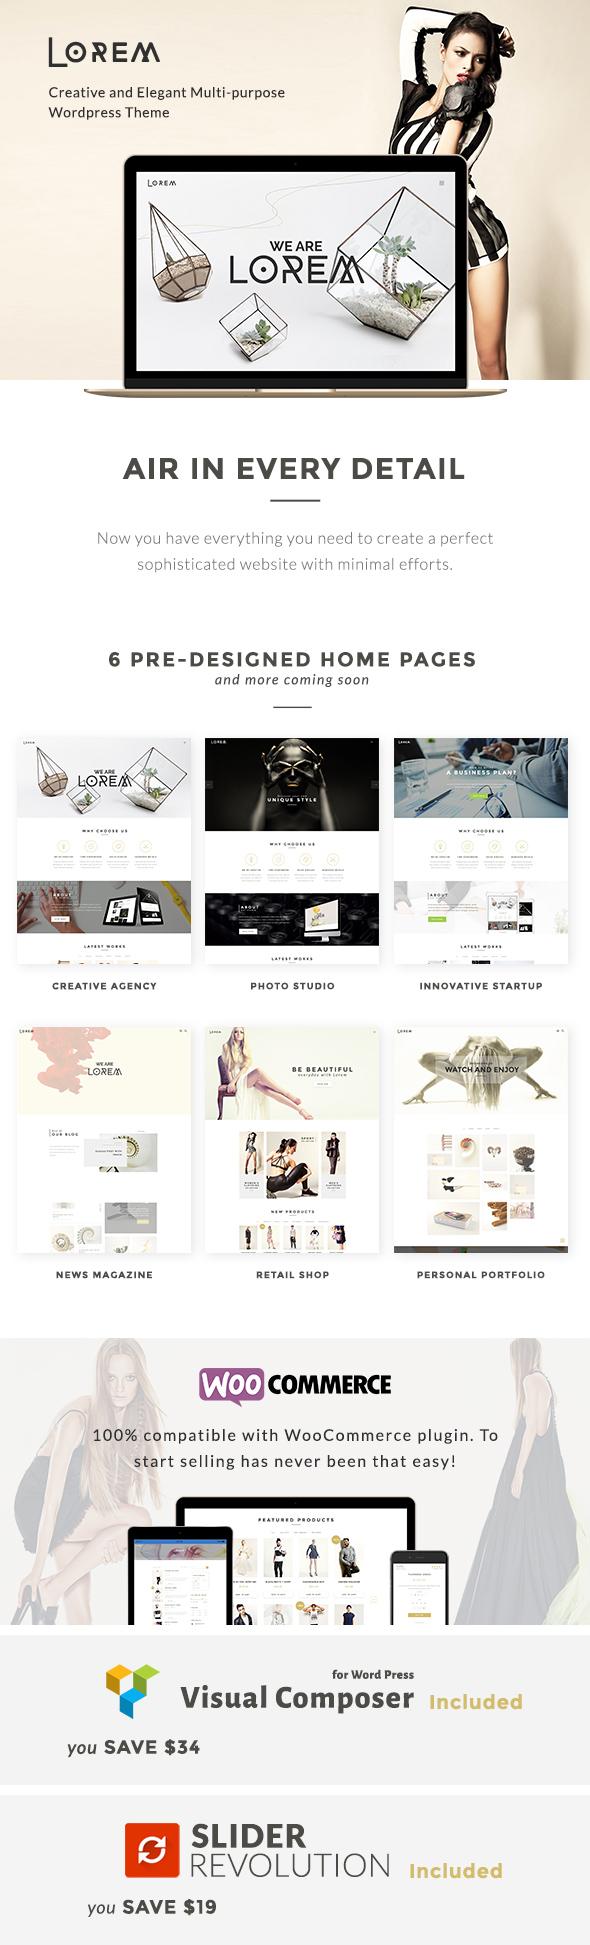 Lorem - Creative & Fashion Store Theme